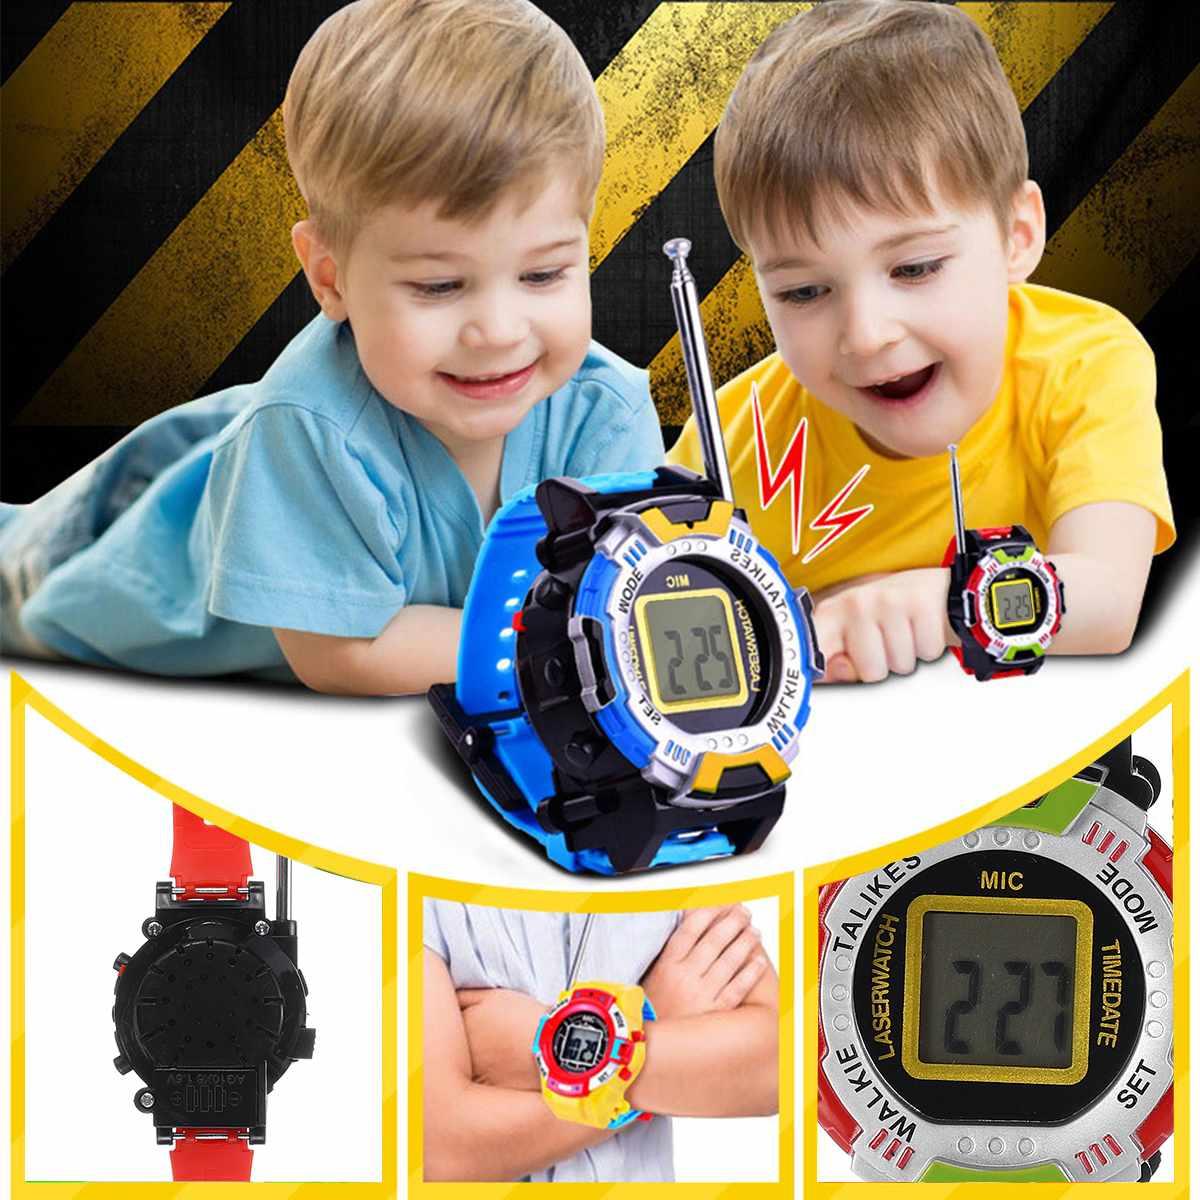 2PCS Walkie Talkie Children Kids Toy Walkie Talkie Family Outdoor Wrist Watch Battery Powered Long Ranges Interactive Smart